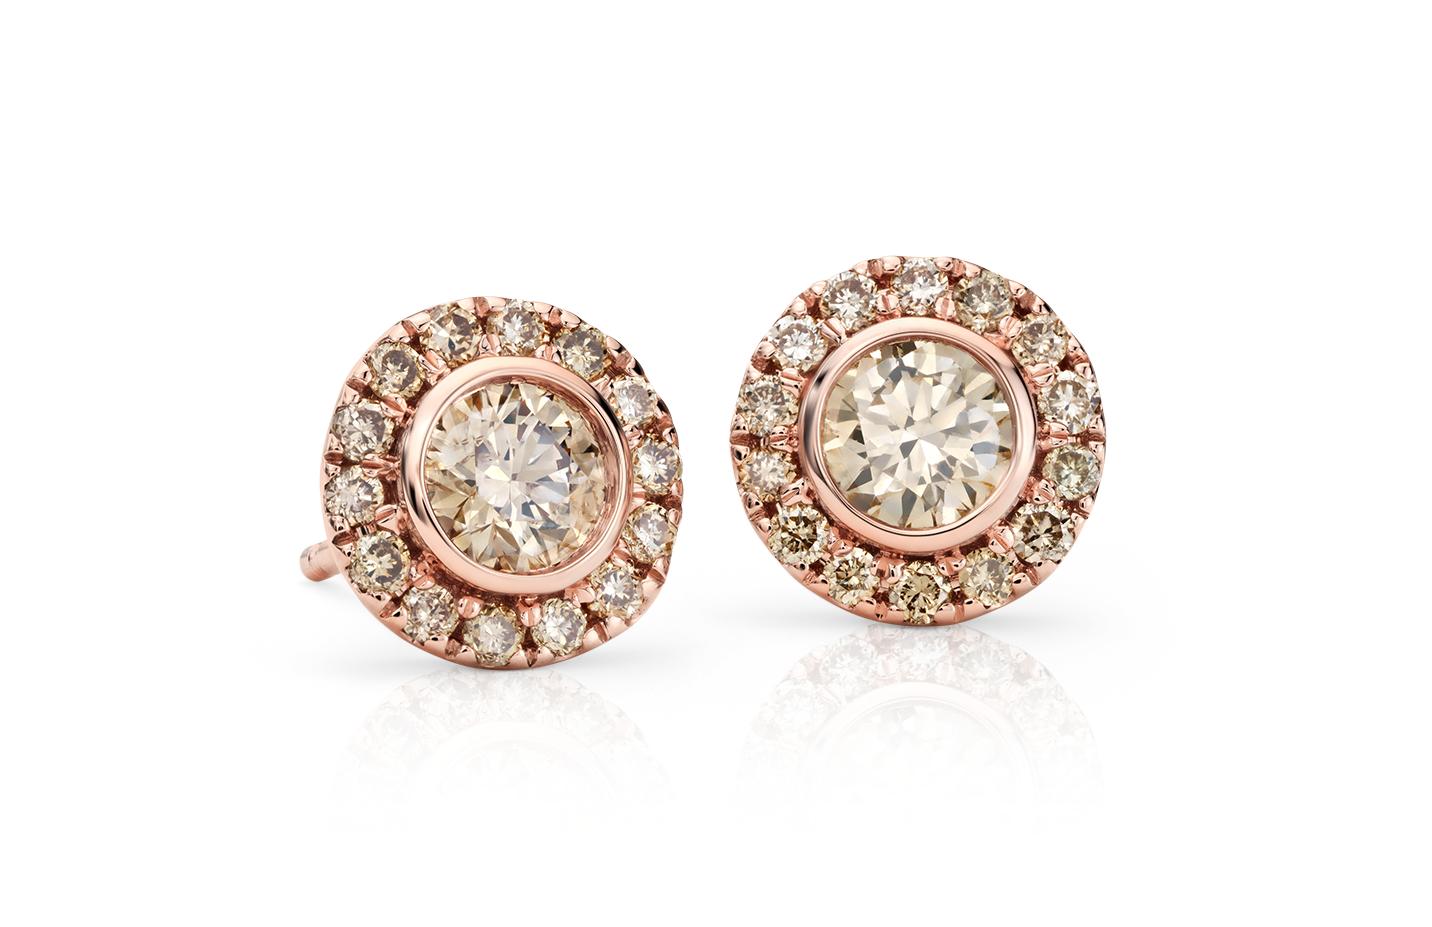 Aretes con halo de diamantes champagne en oro rosado de 14k (1 qt. total)